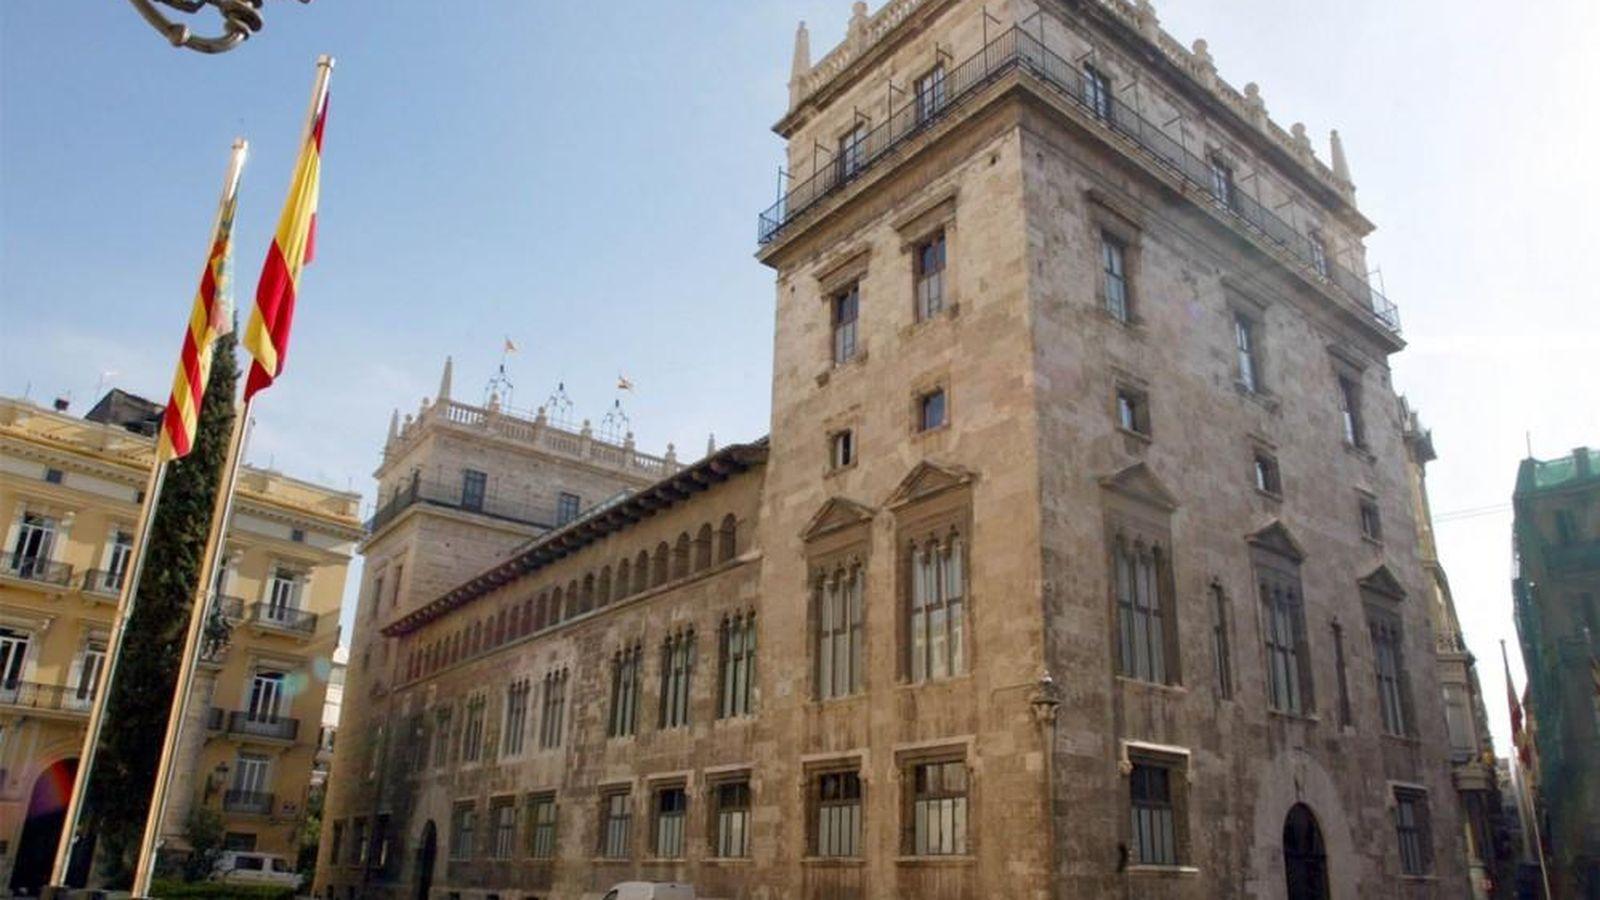 Foto: El Palacio de Benicarló, sede de la Generalitat de Valencia. (EFE)